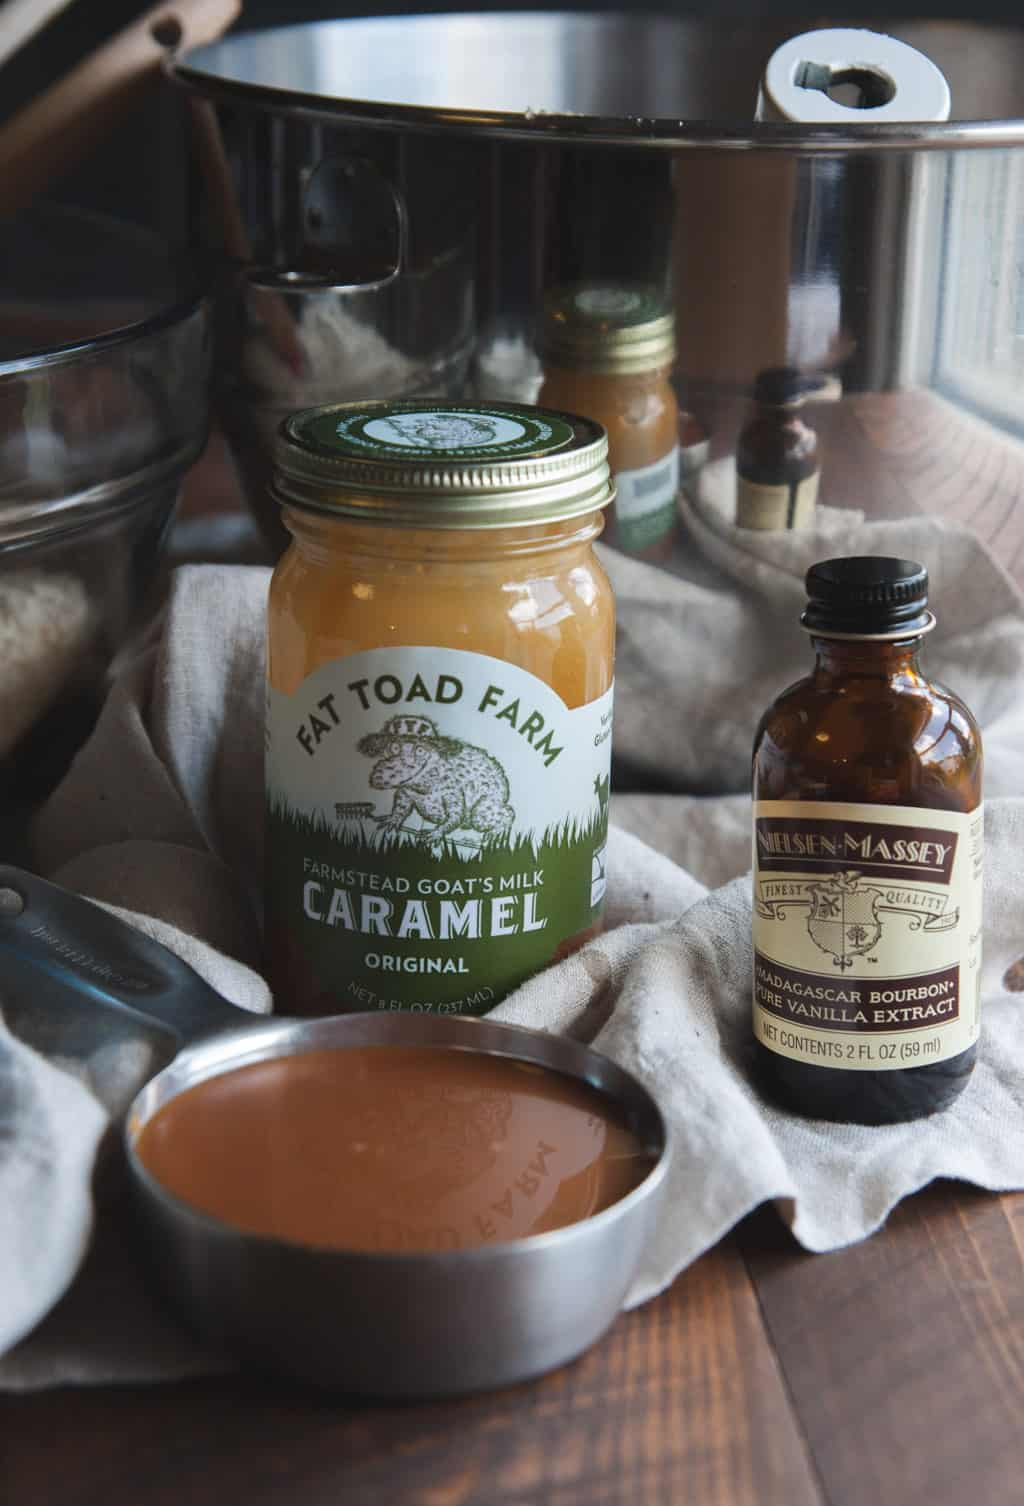 Fat toad farm caramel and Nielsen Massey Vanilla